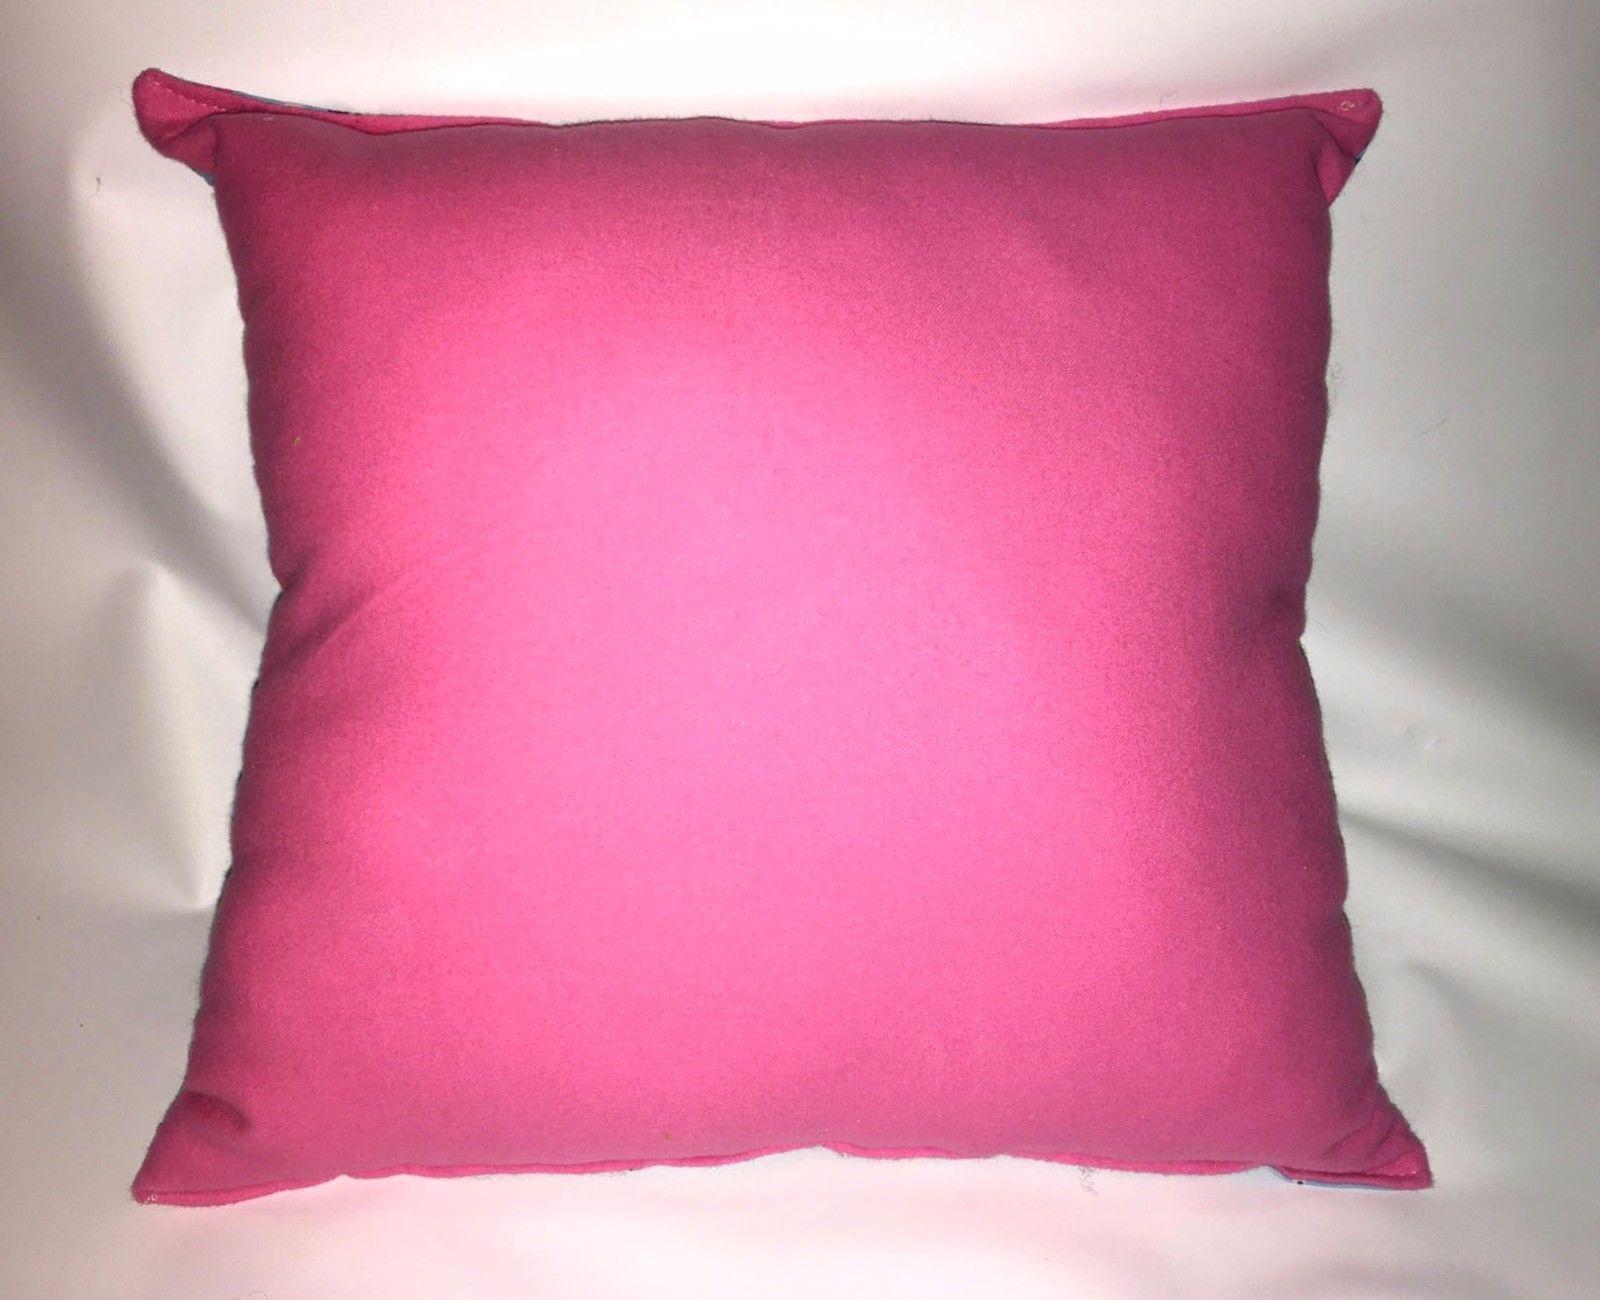 Doc McStuffins Pillow And Blanket Dr McStuffins Pillow and Blanket Set Handmade